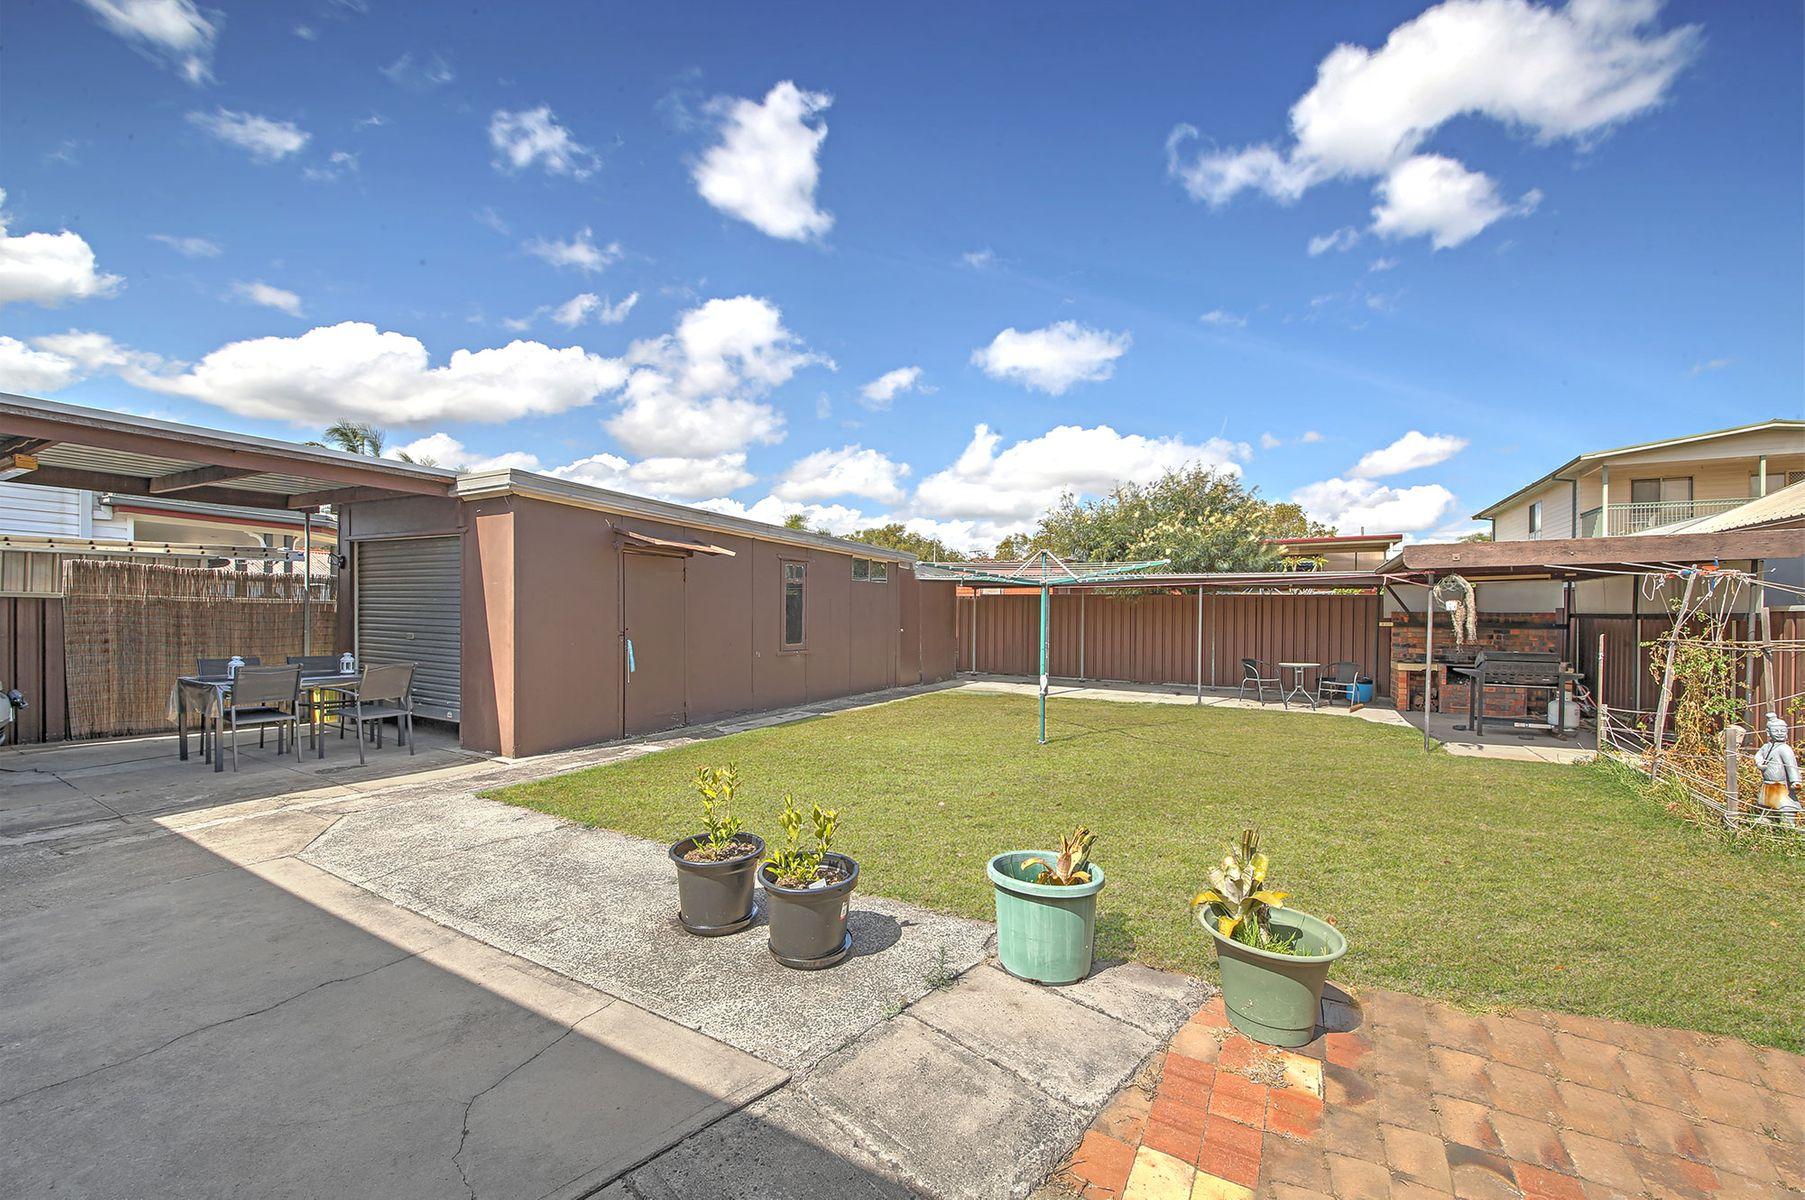 18 Armentieres Ave, Milperra NSW 2214, Australia, House ...